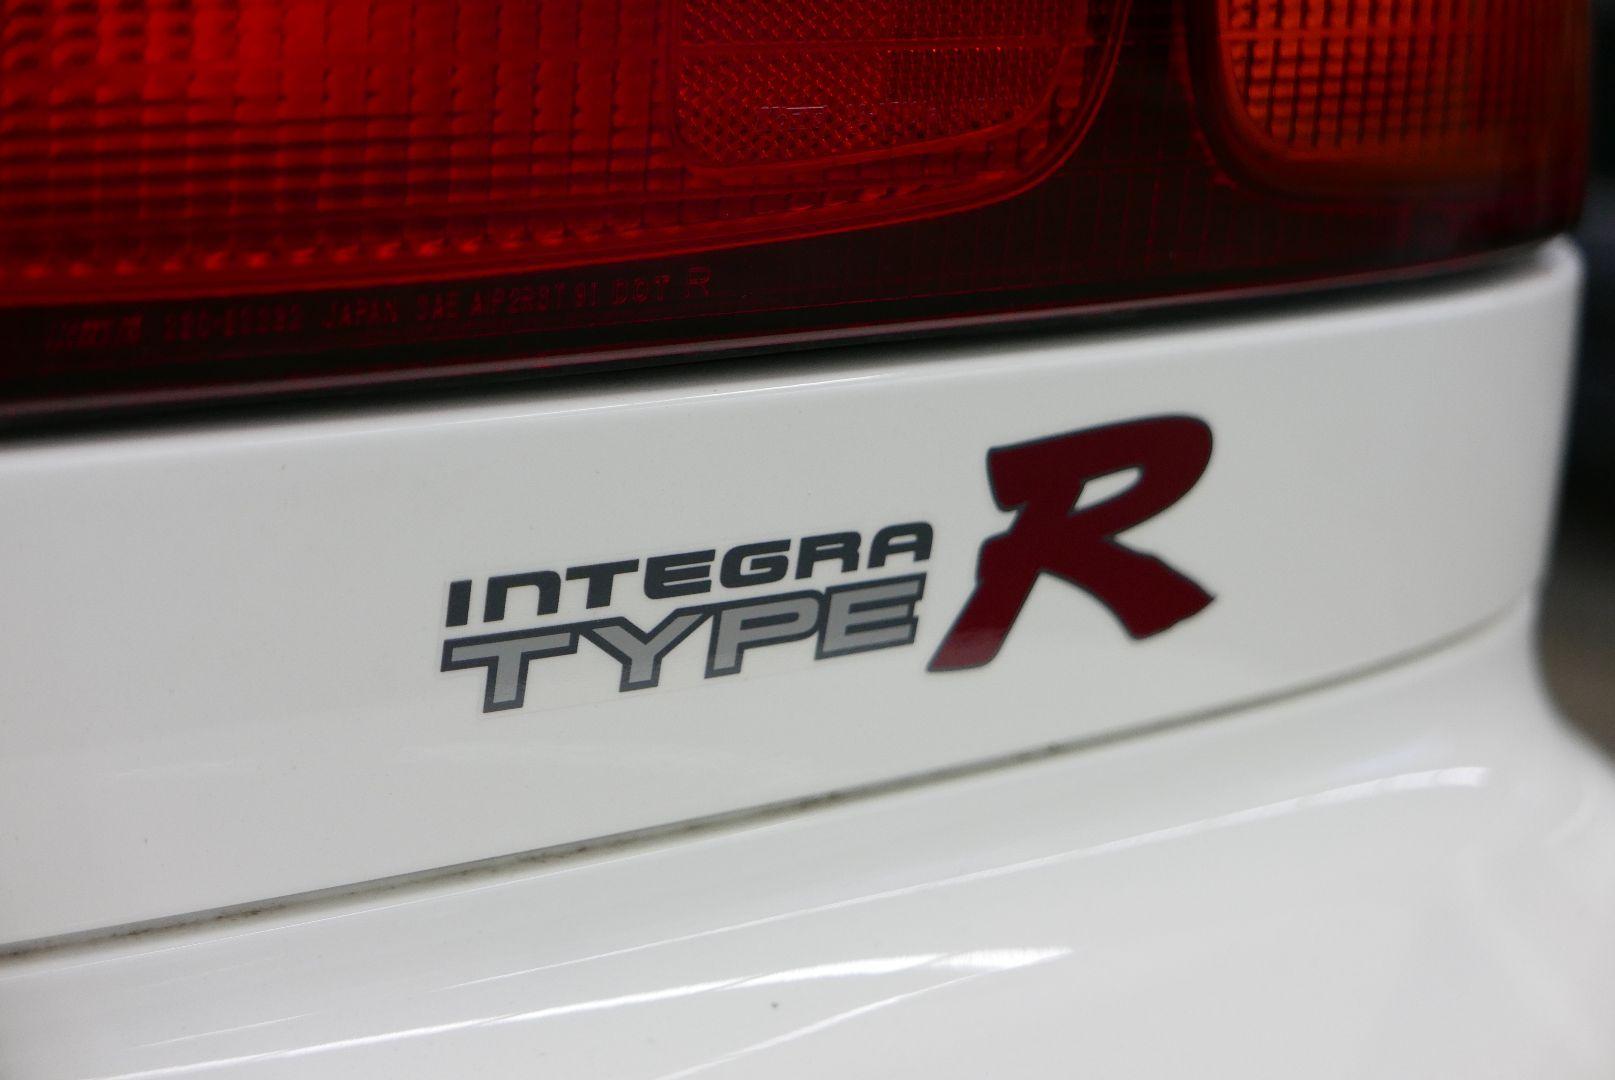 1997-Honda-Integra-Type-R-11